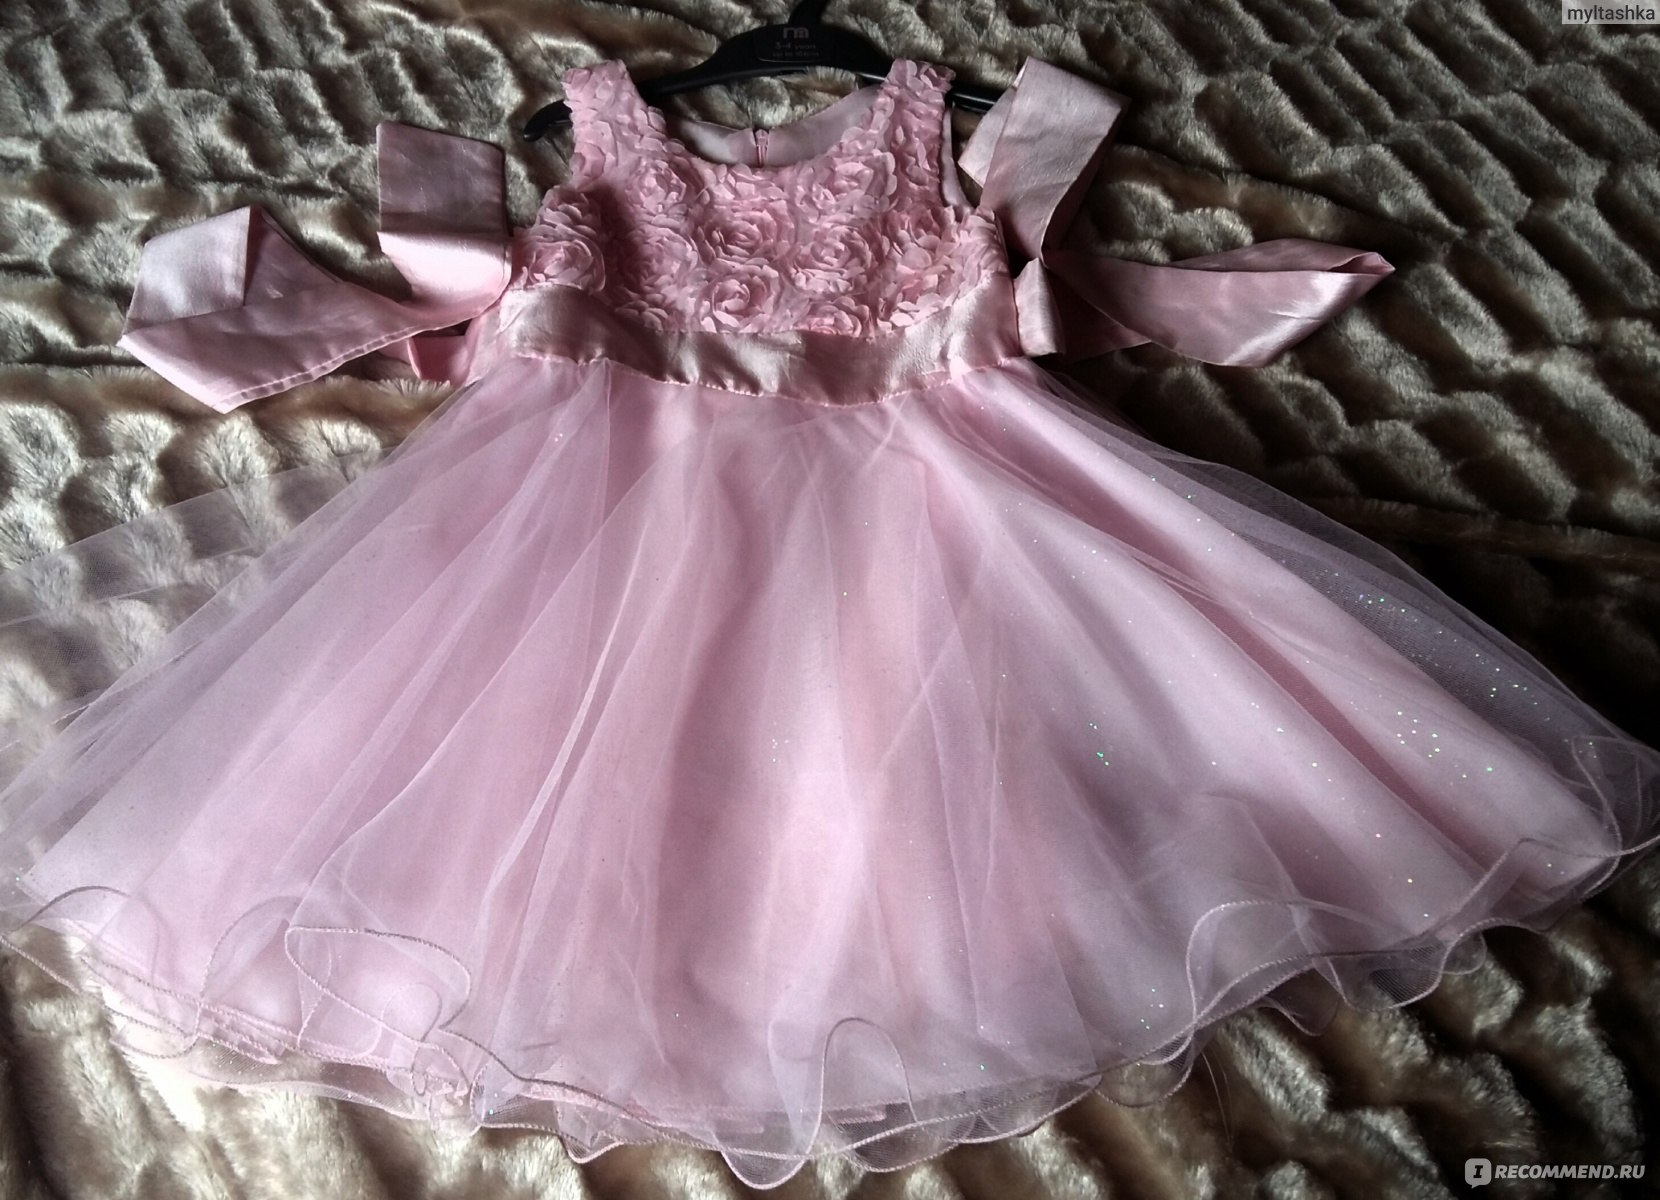 Платье AliExpress Retail Girls Dress Princess dress children s Party dress  with bow girl wedding flower Baby 556085780866